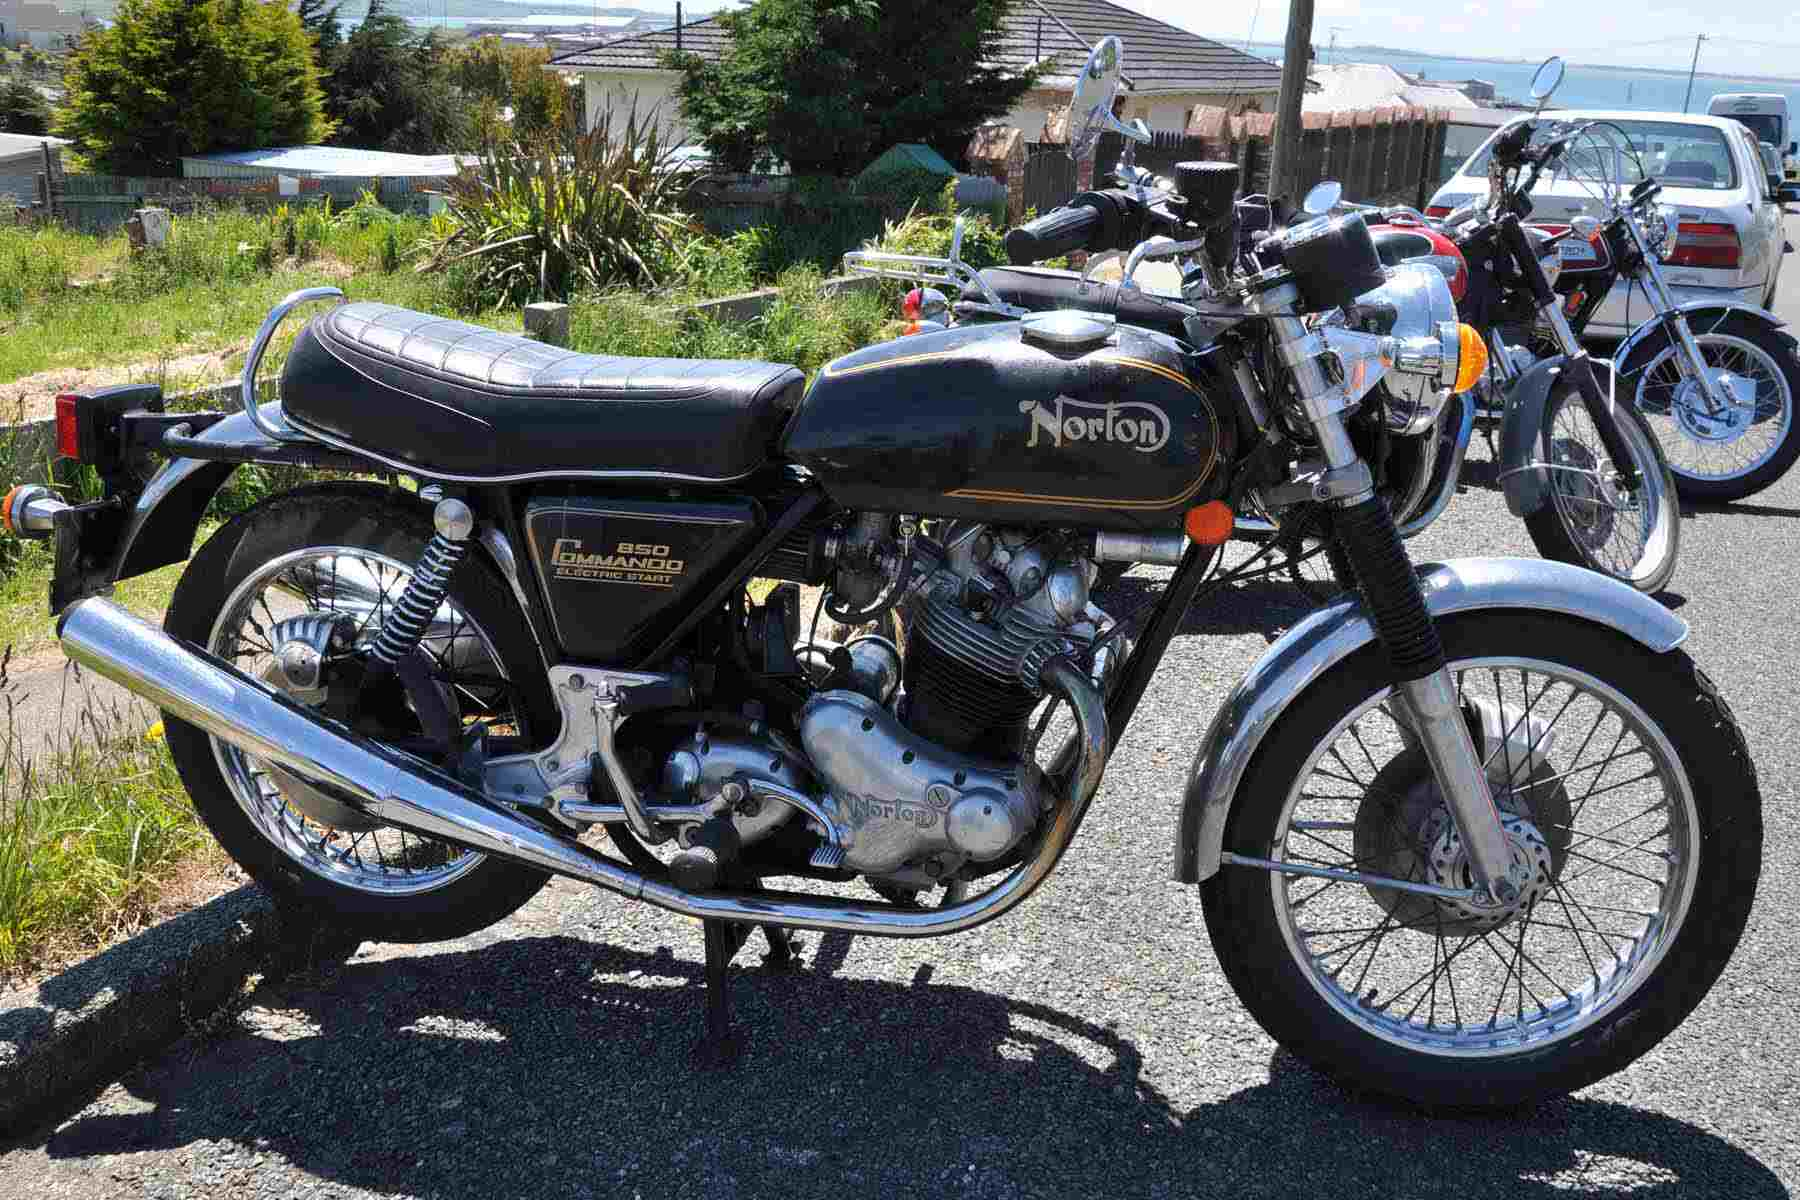 A 1975 Norton Commando 850.